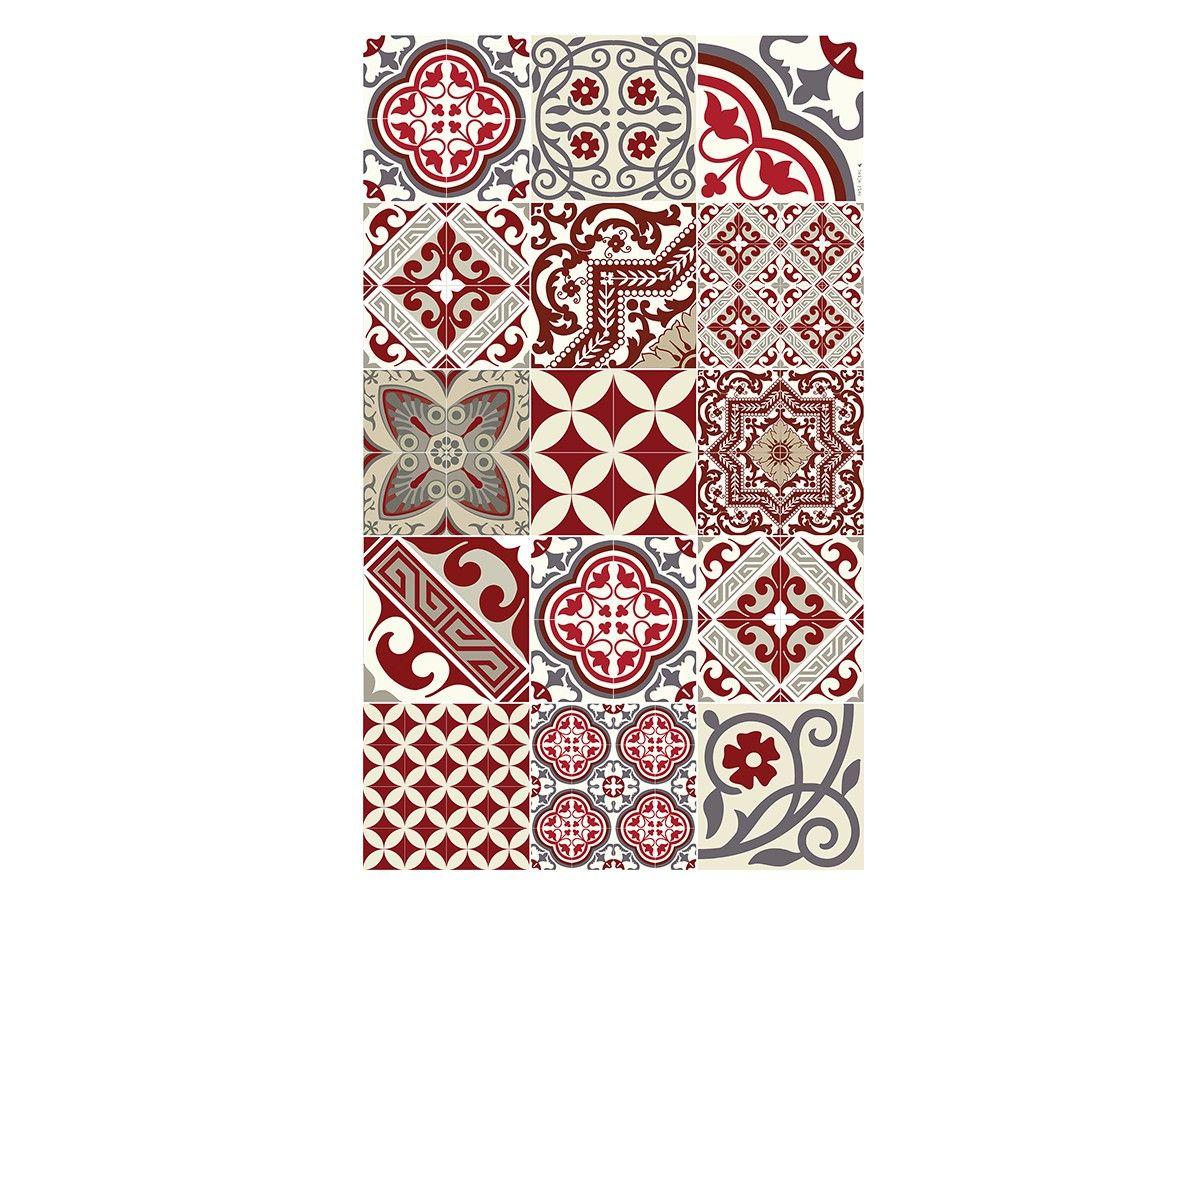 Tapis Vinyle - Eclectic - Rouge & Gris - 60 x 97 cm - Beija Flor ...